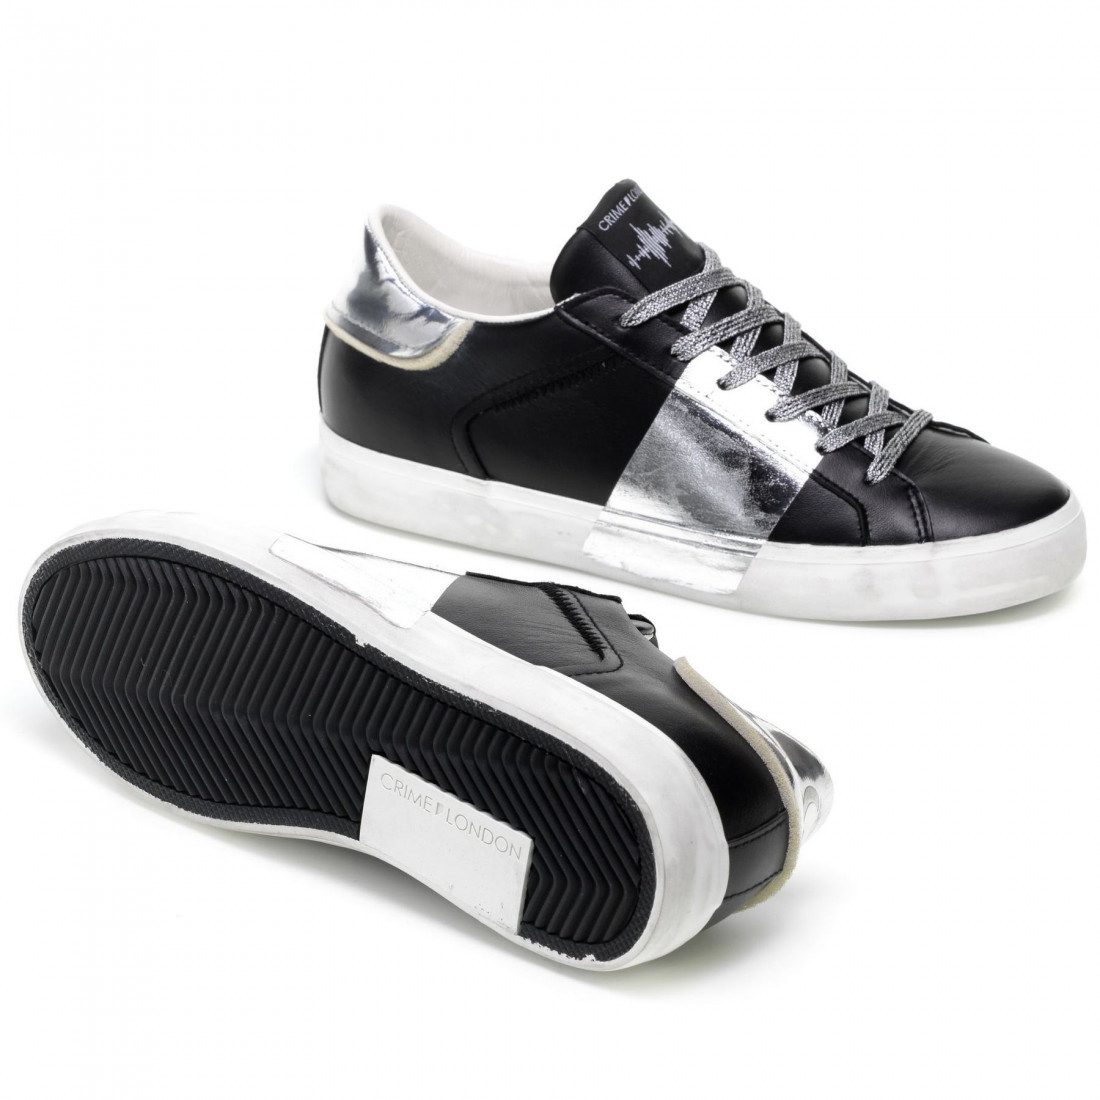 sneakers damen crime london 2500620 black 7839